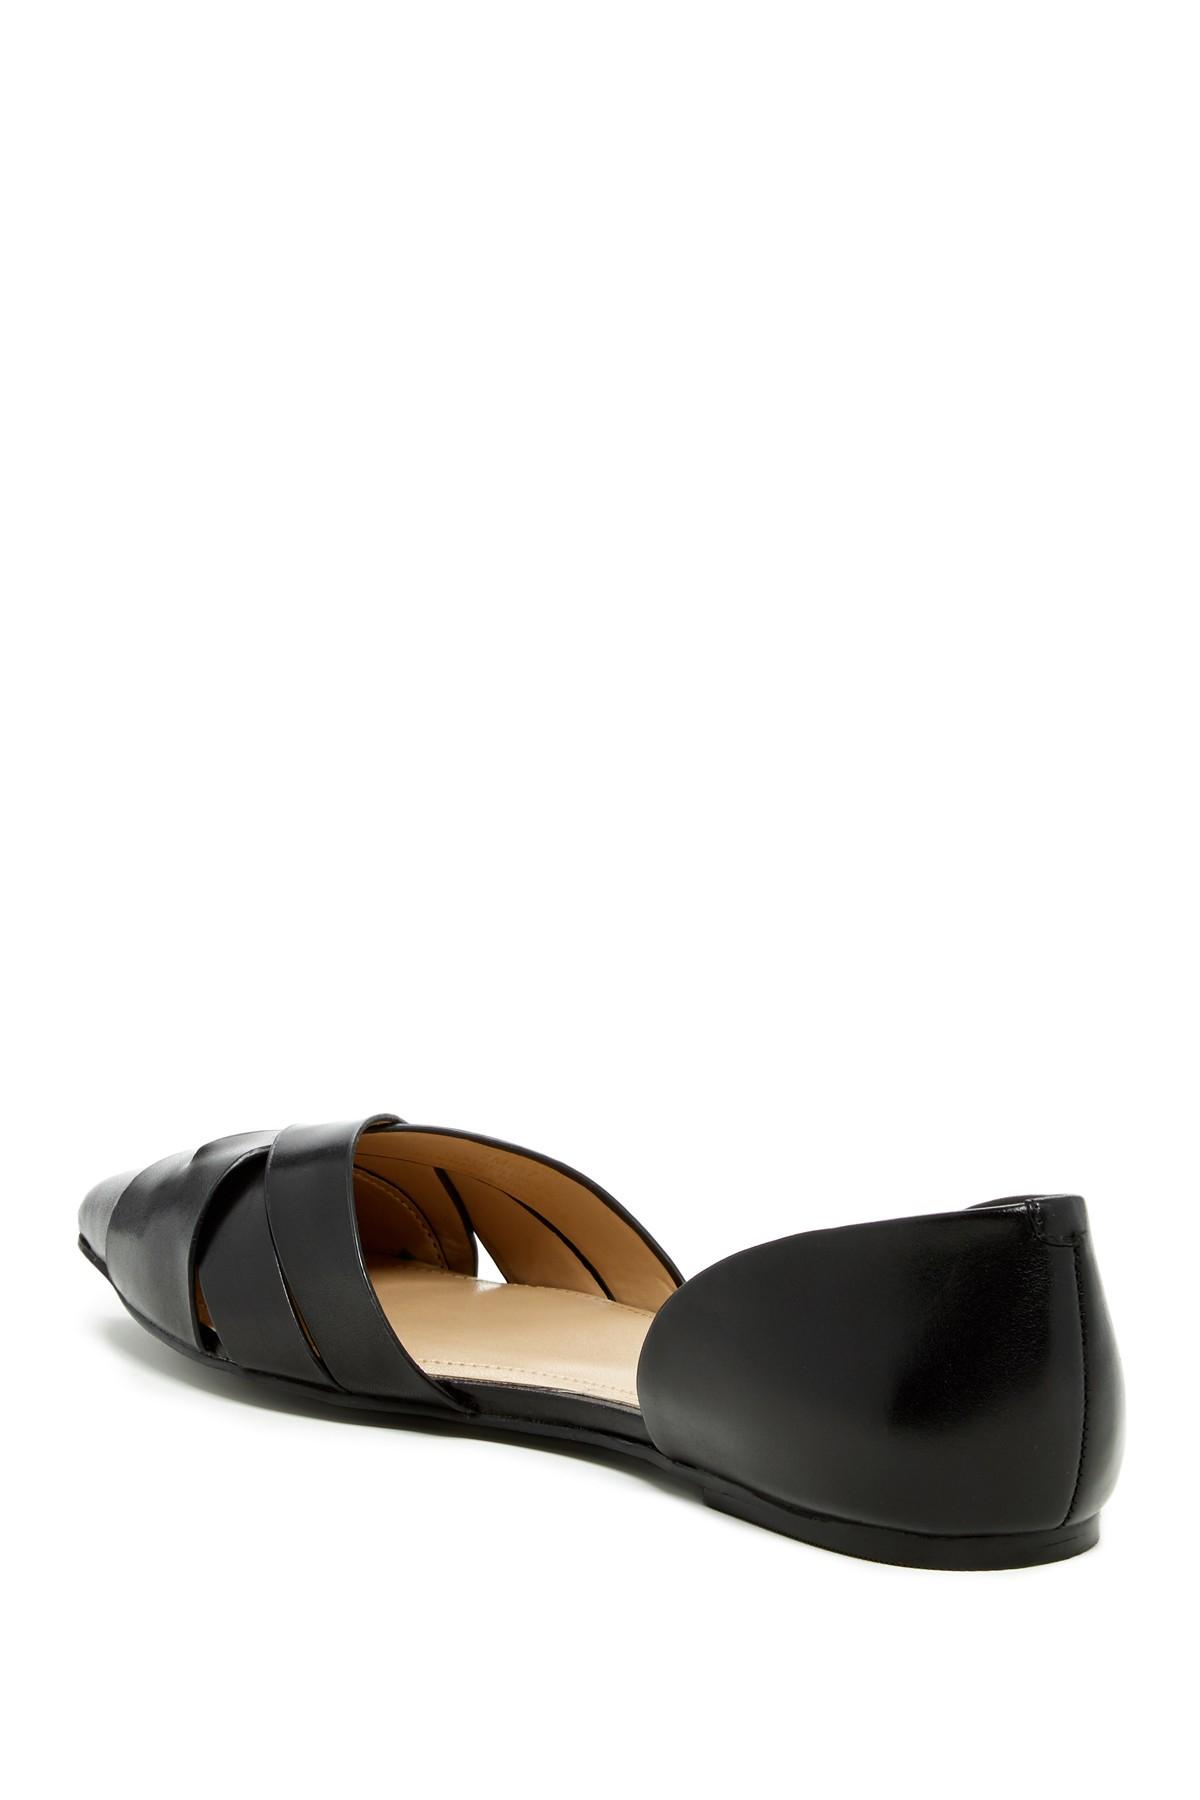 Pepper Bcbgeneration Shoes Flat